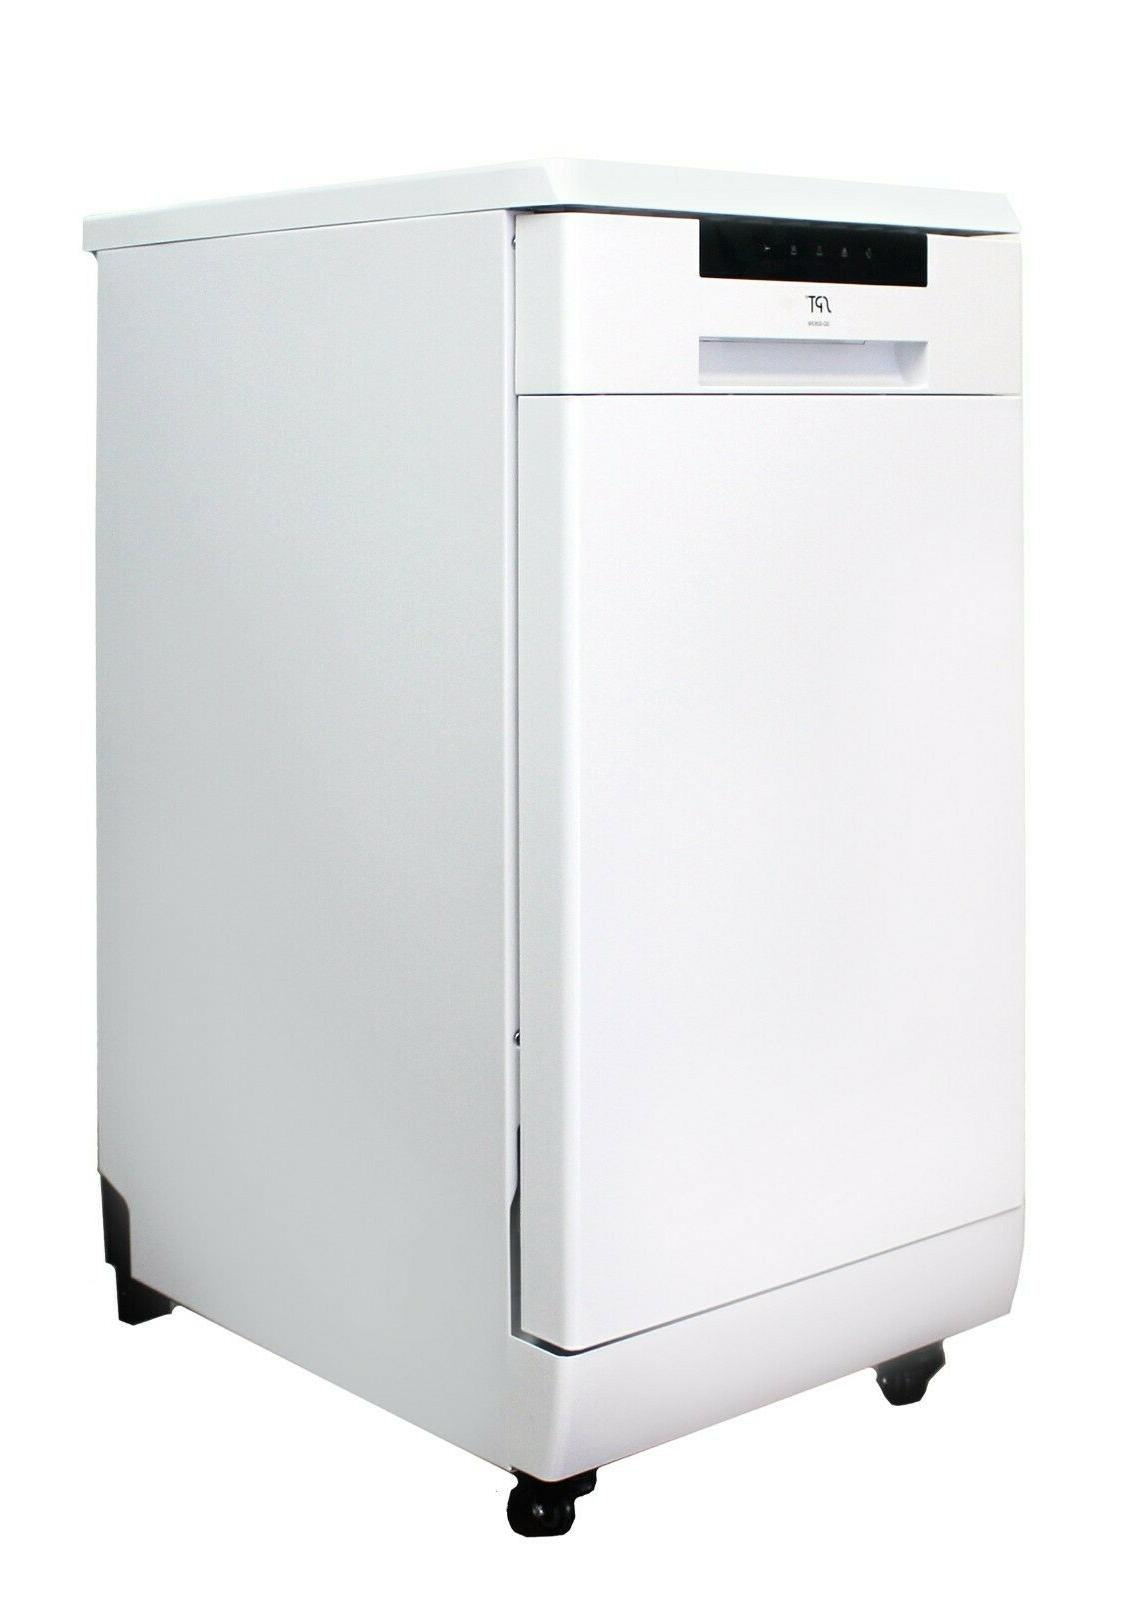 "Sunpentown SPT 18"" Dishwasher - ENERGY STAR - White SD-9263W"